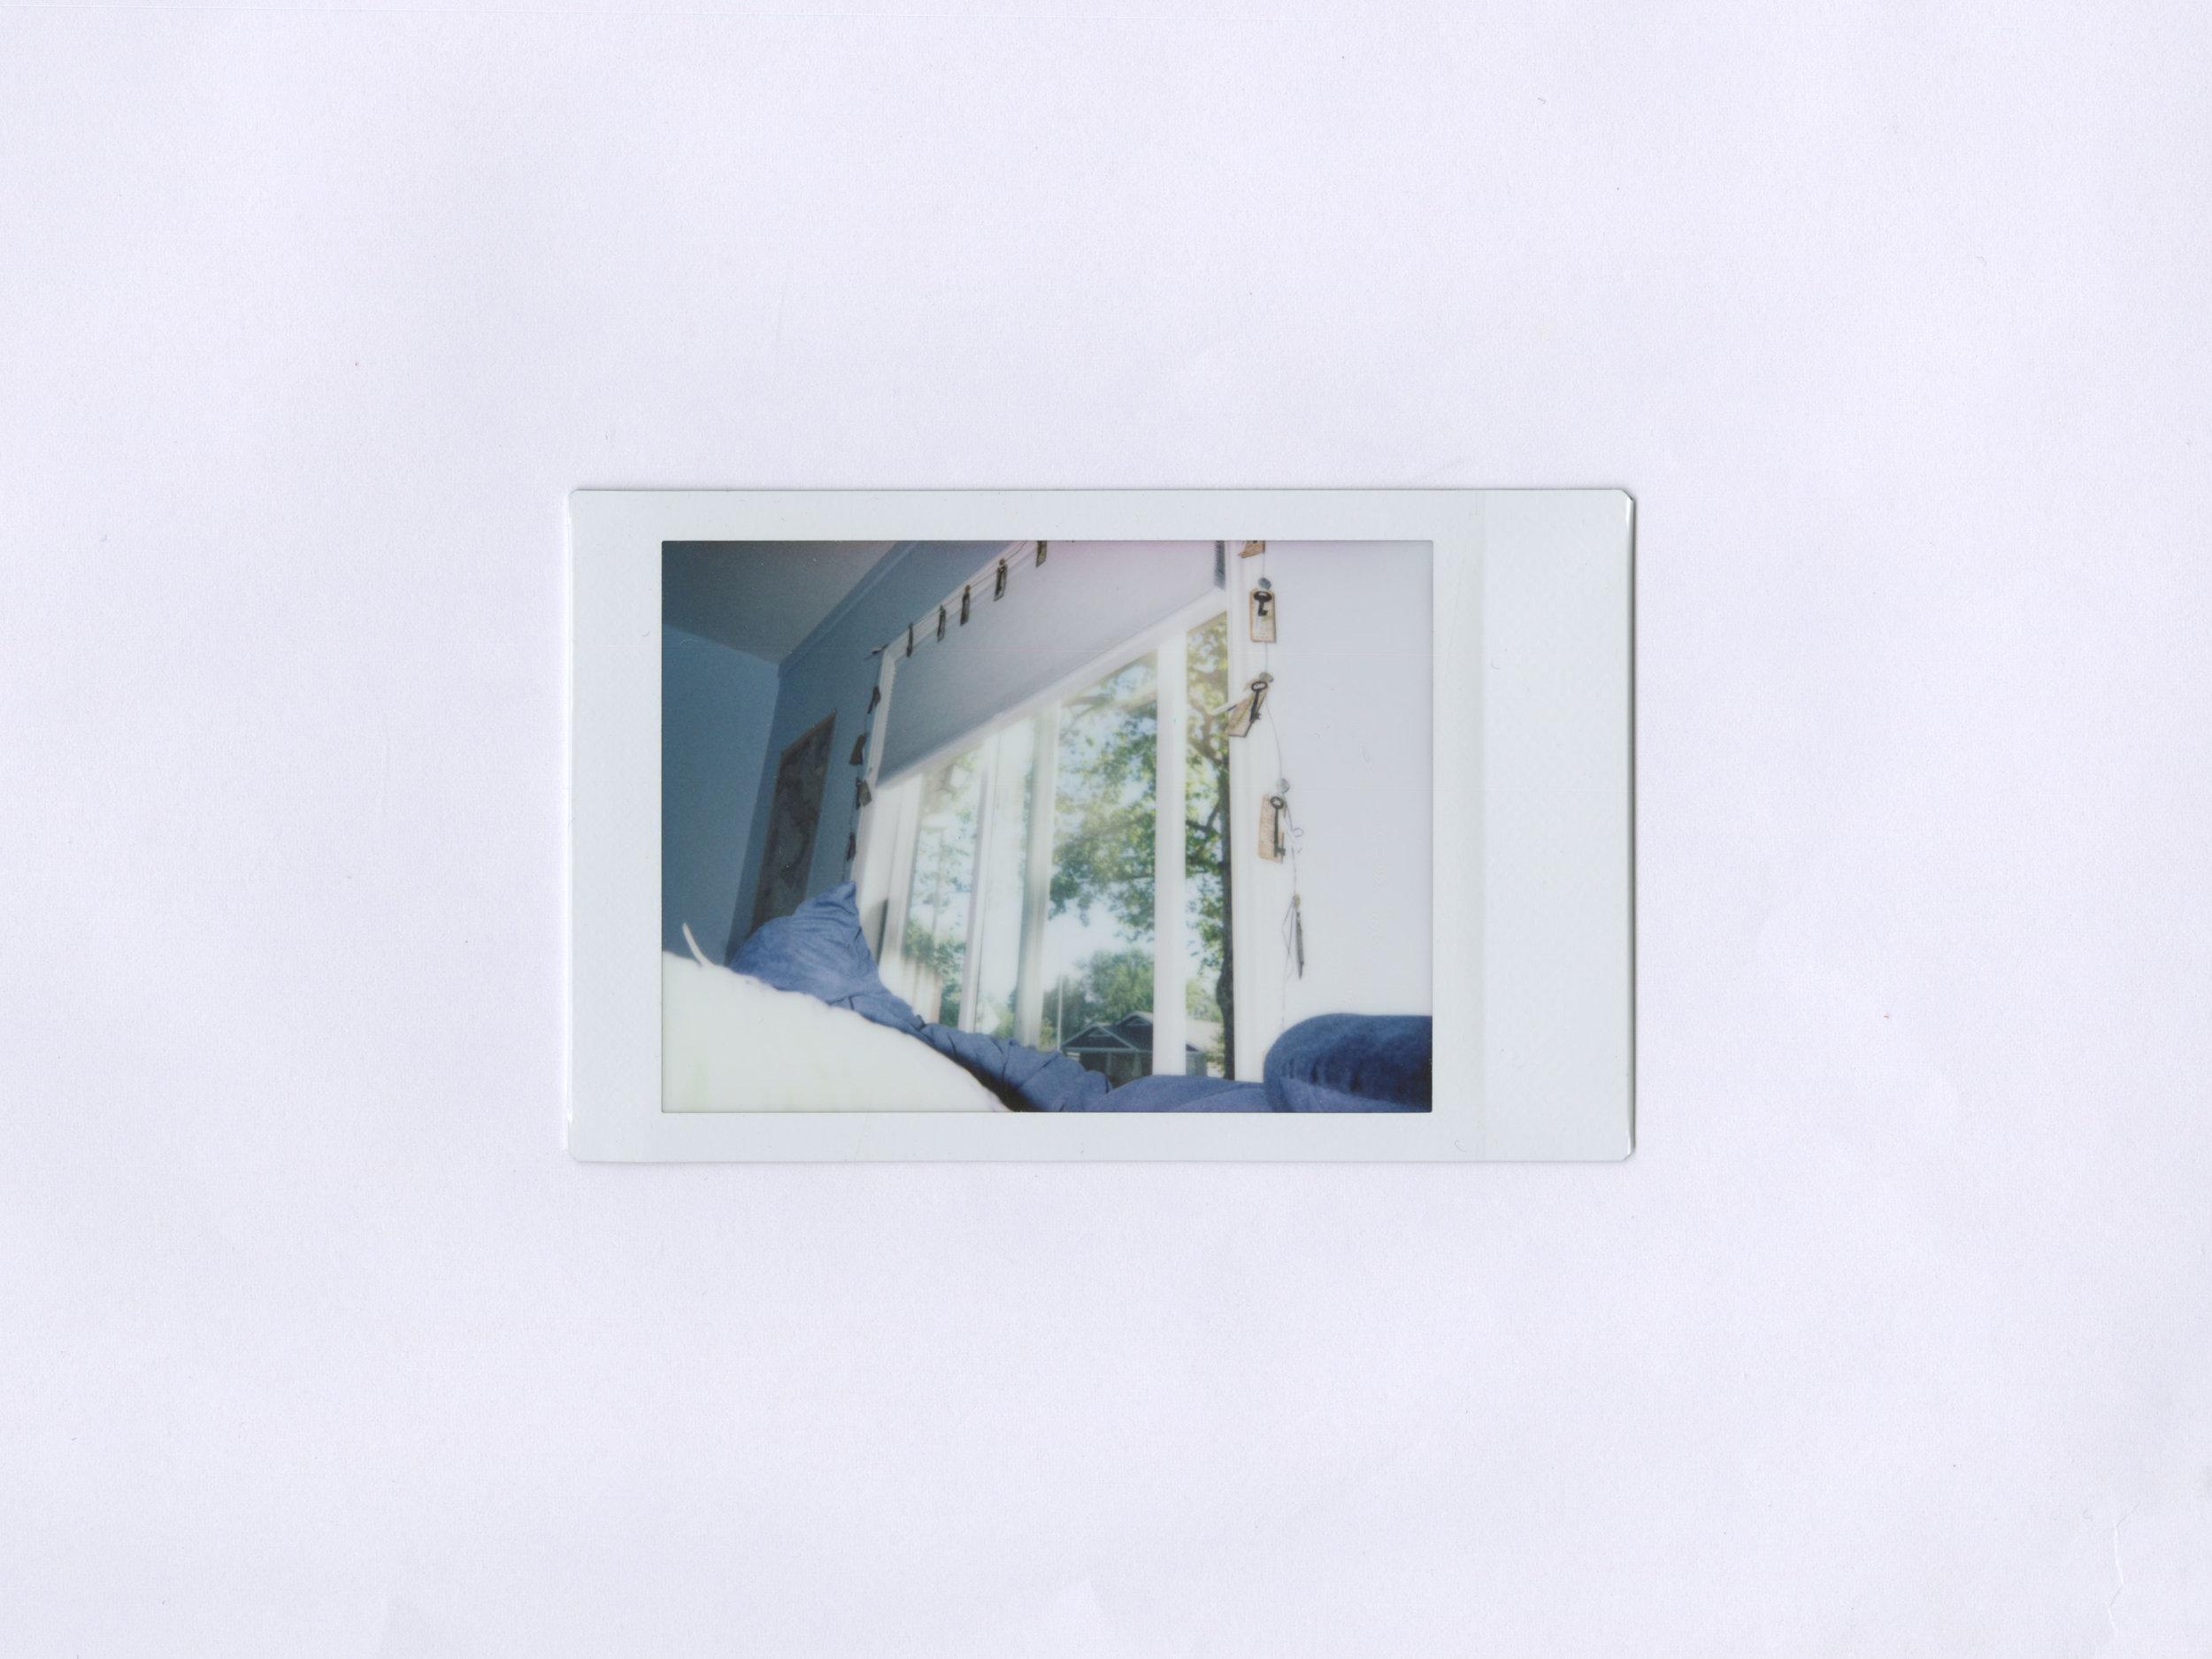 10.fdc210.jpg